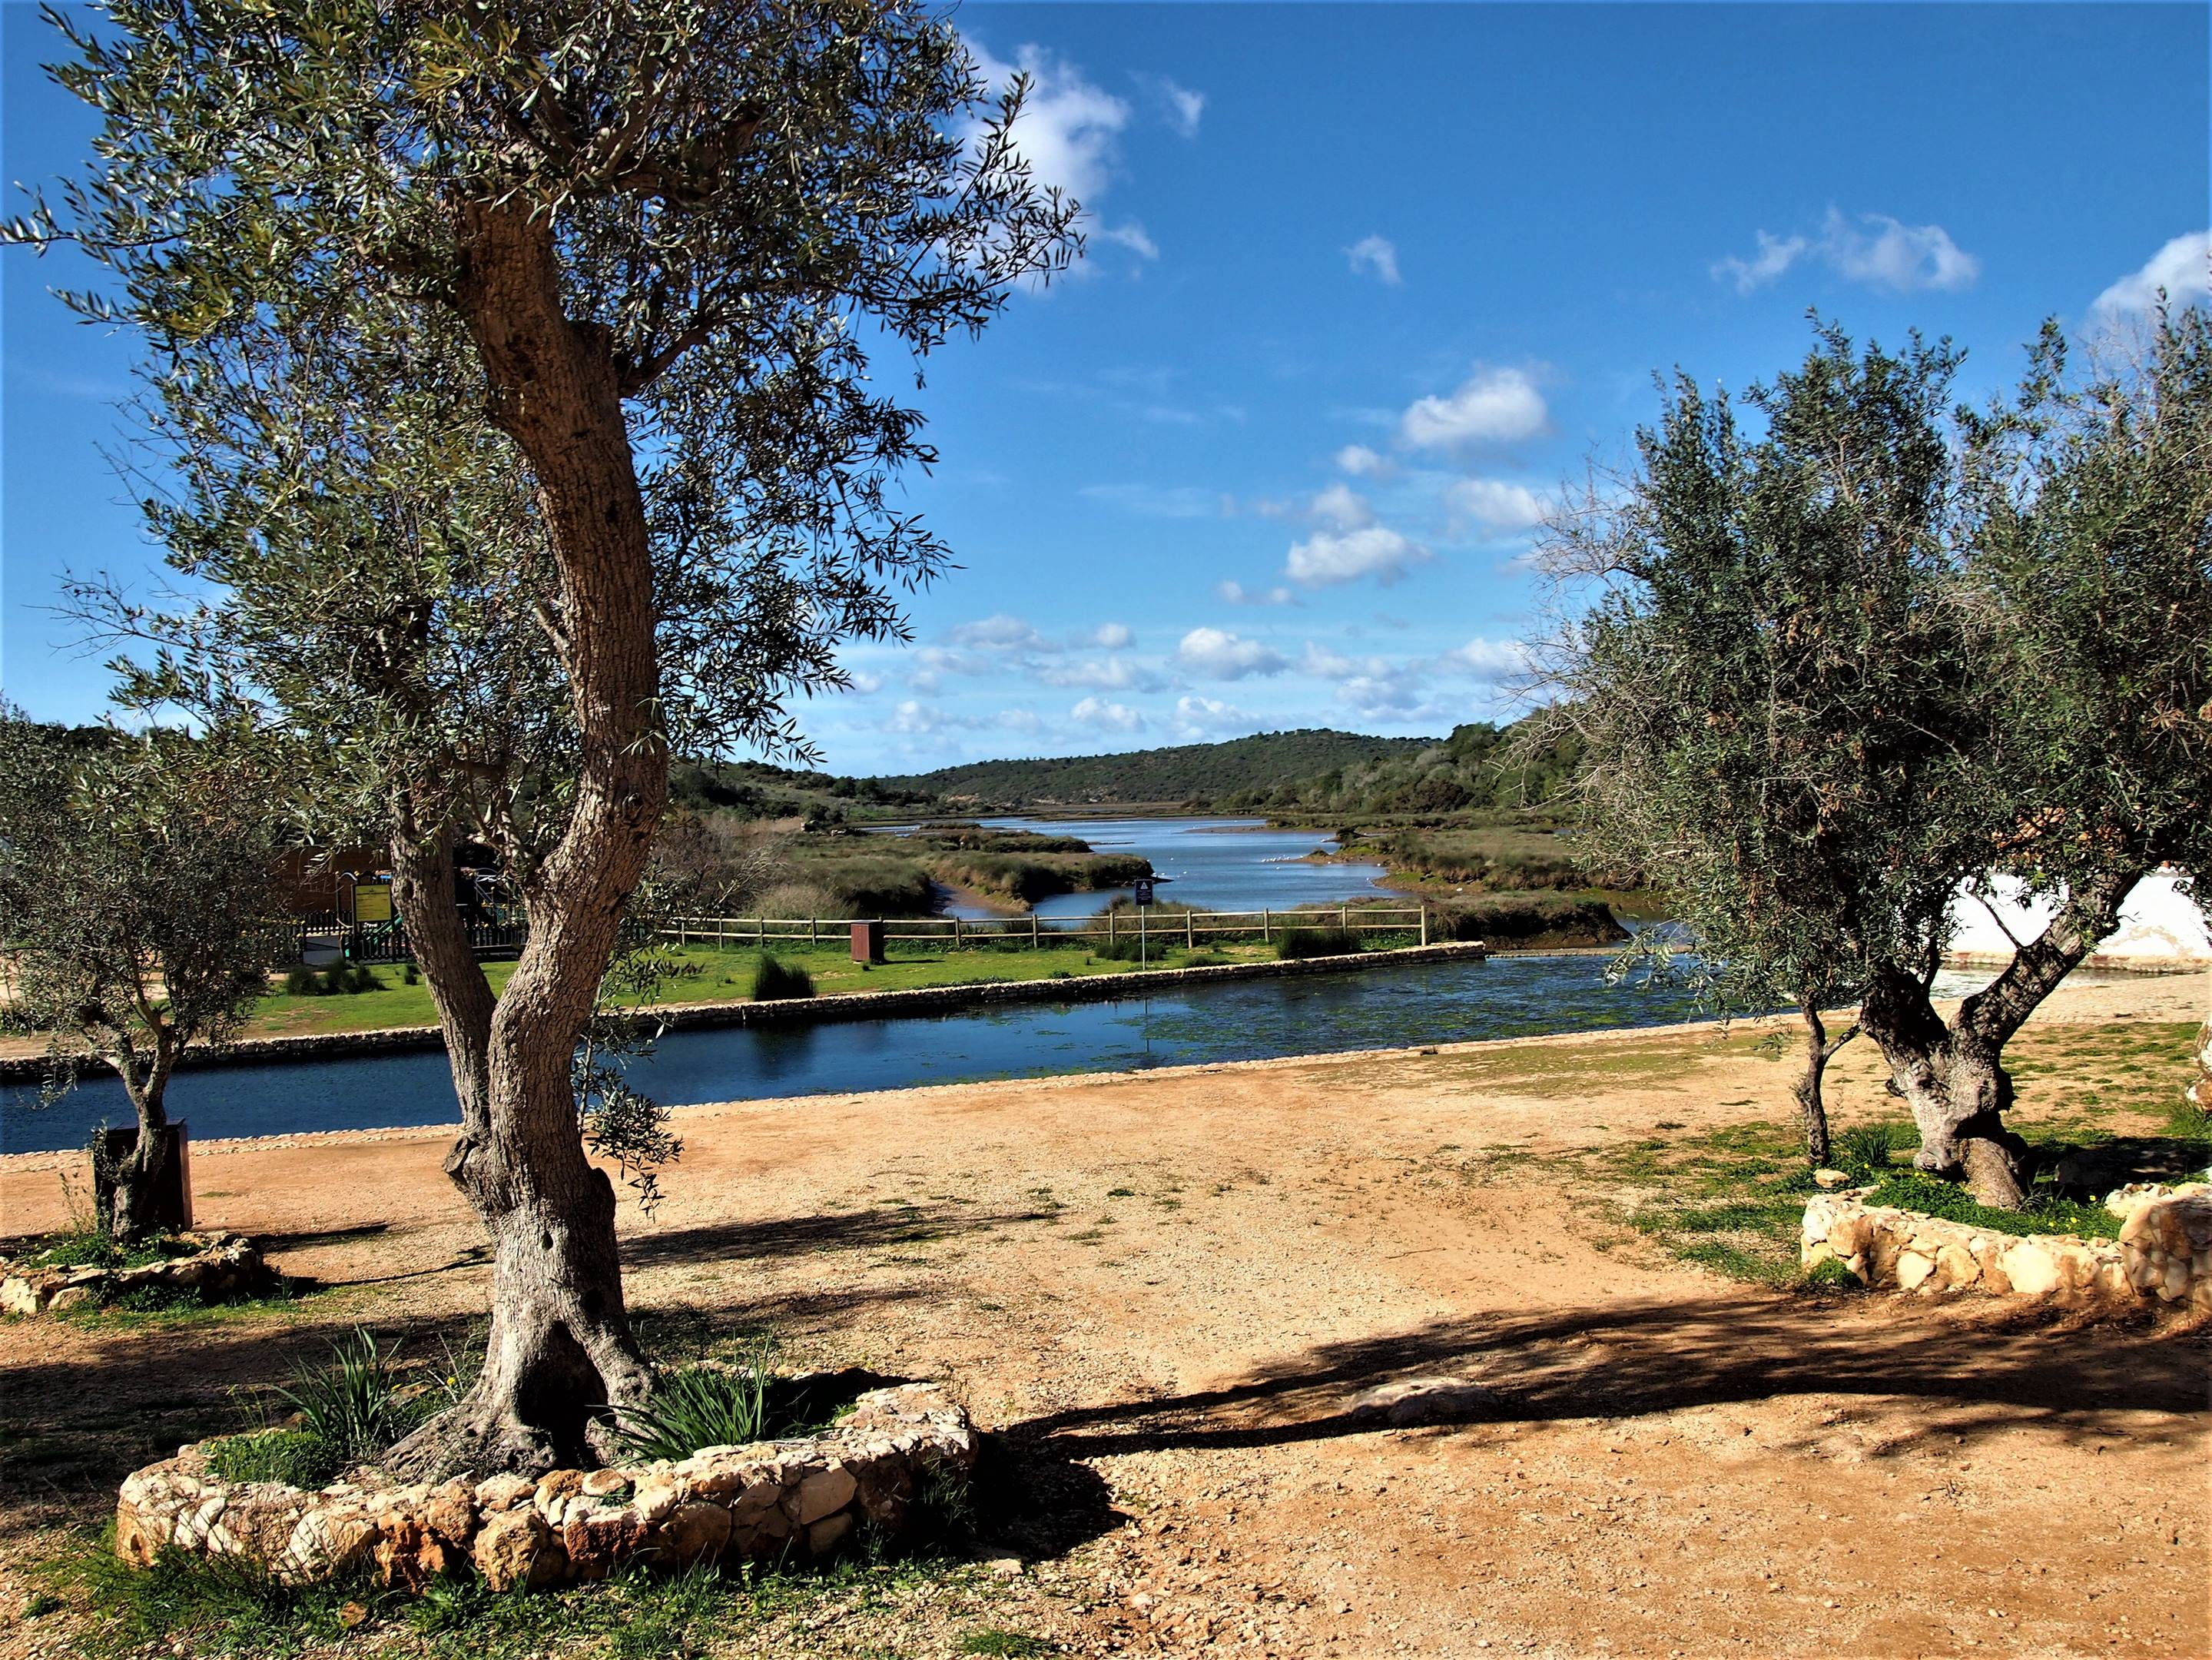 Sítio das Fontes, Estombar, Algarve